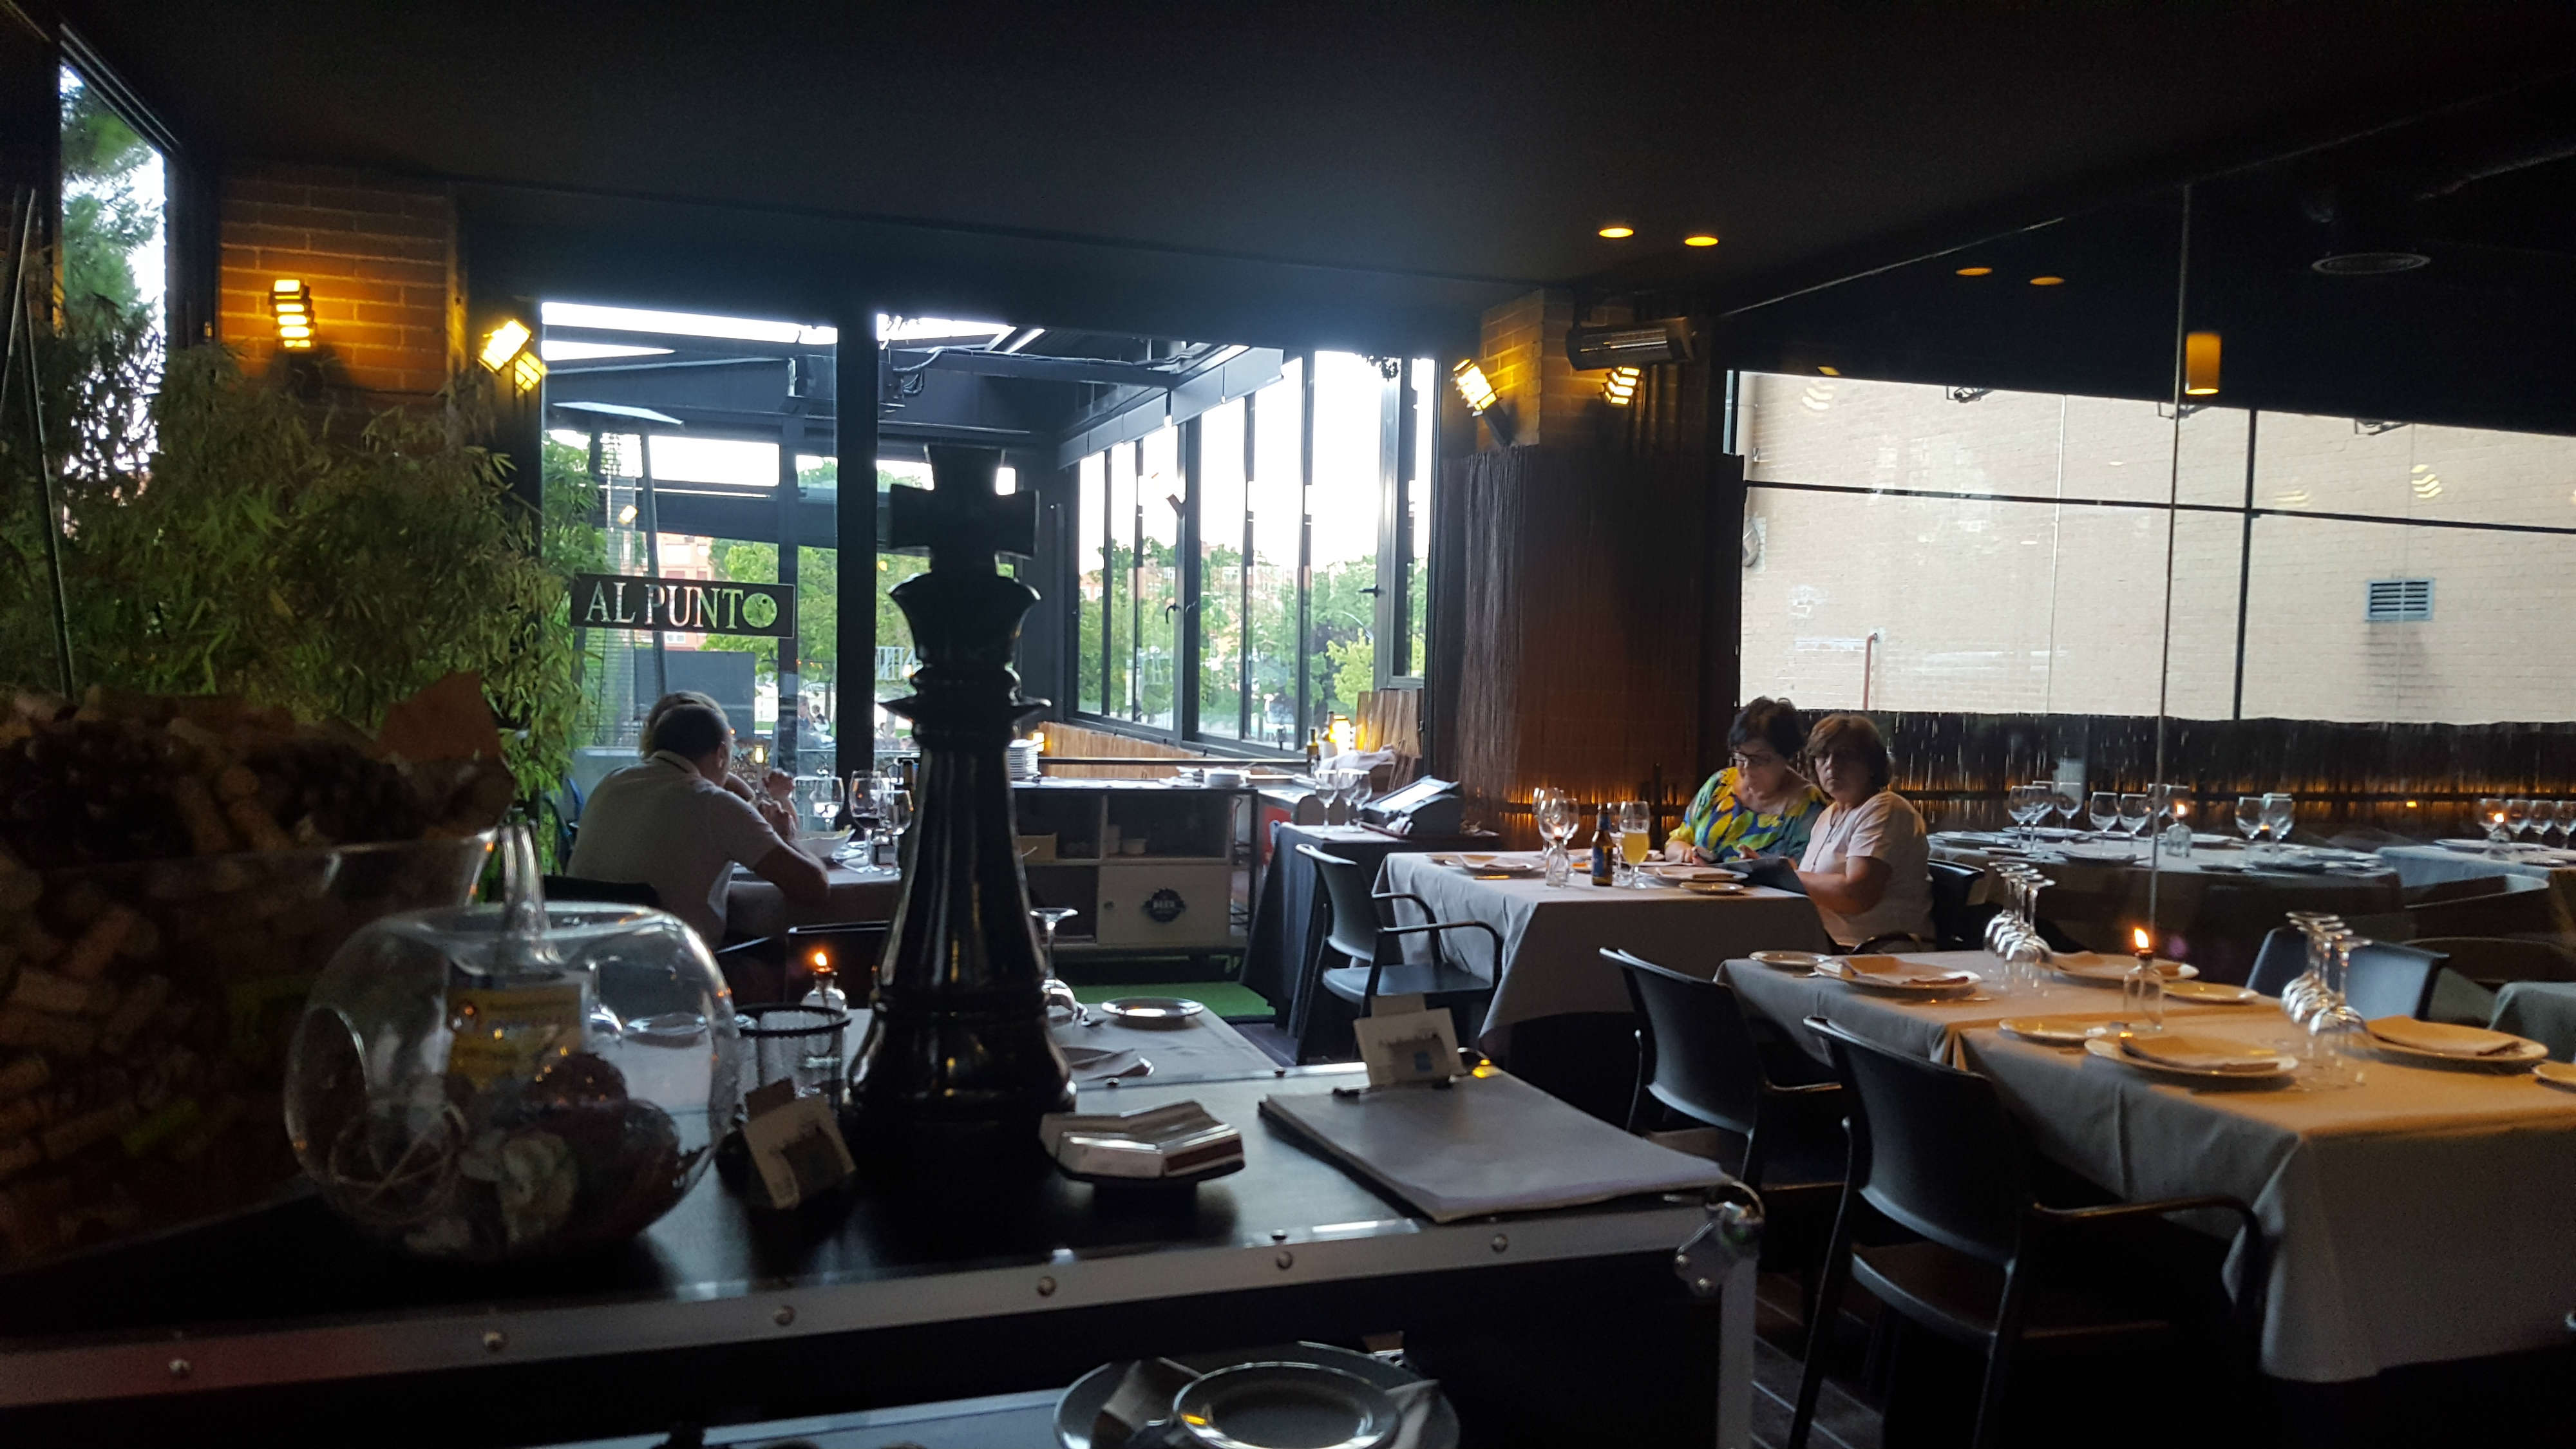 Restaurante al punto madrid - Restaurante al punt ...